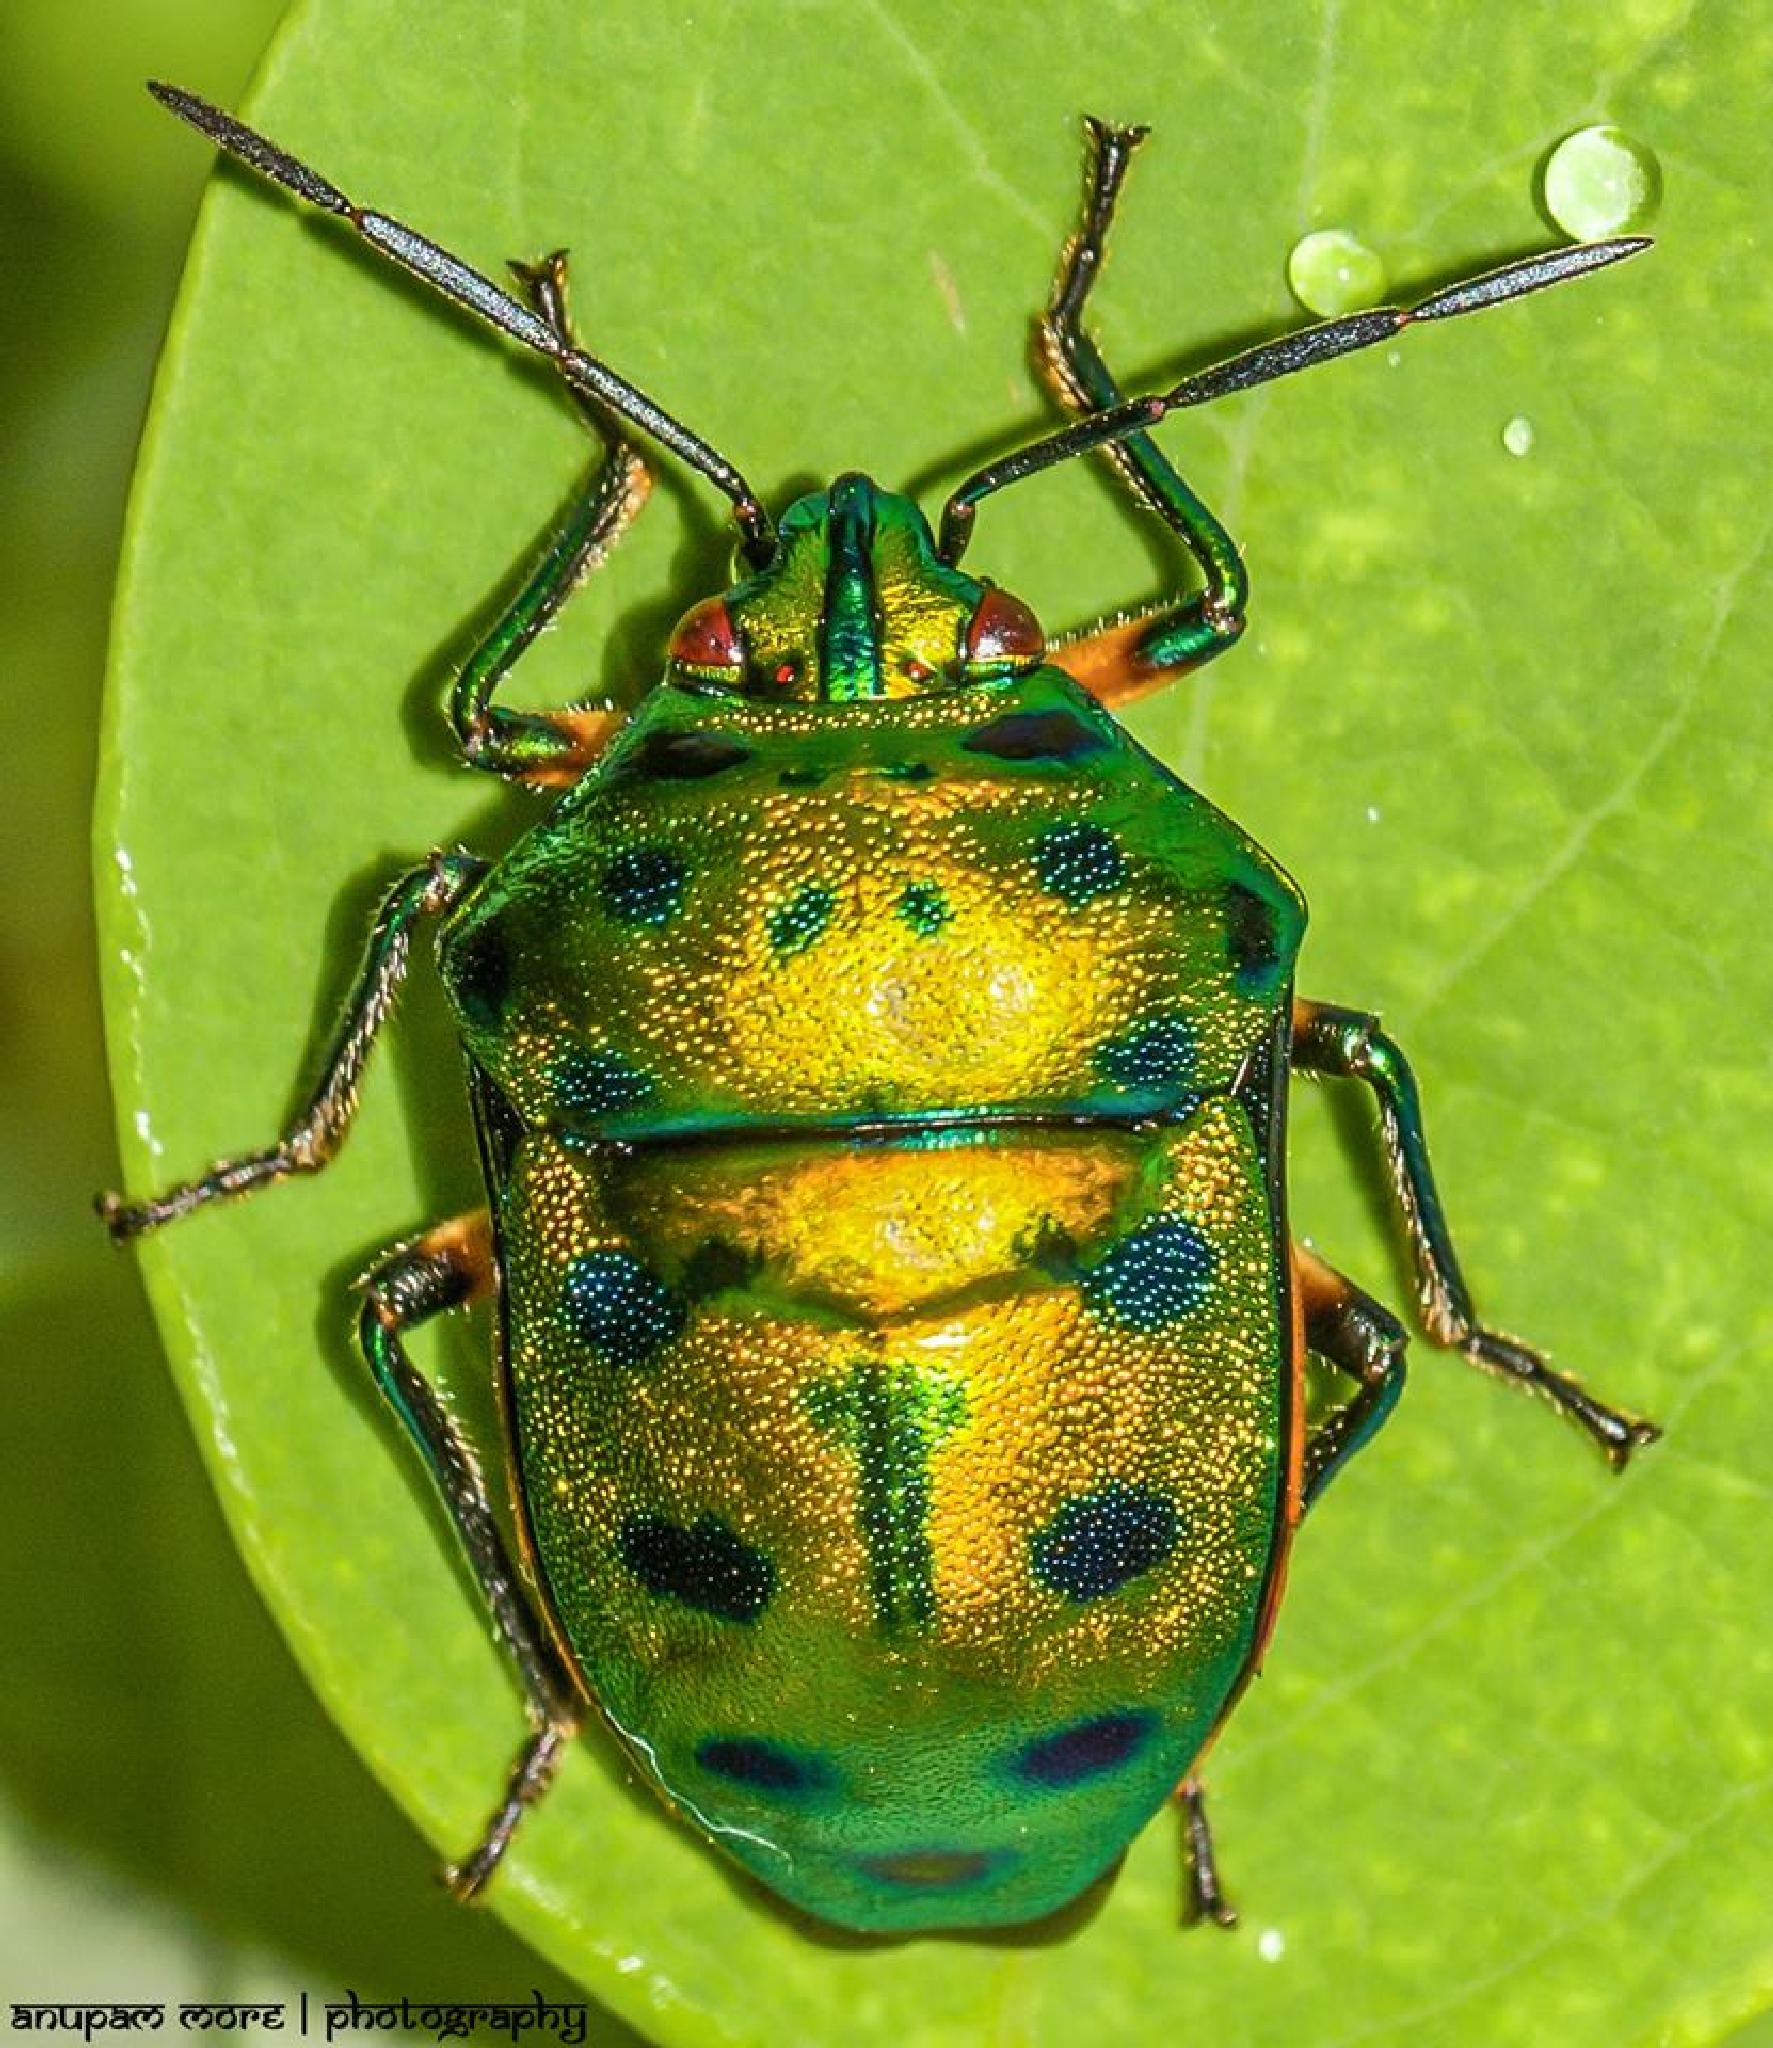 Jewel bugs (Scutelleridae) by Anupam More